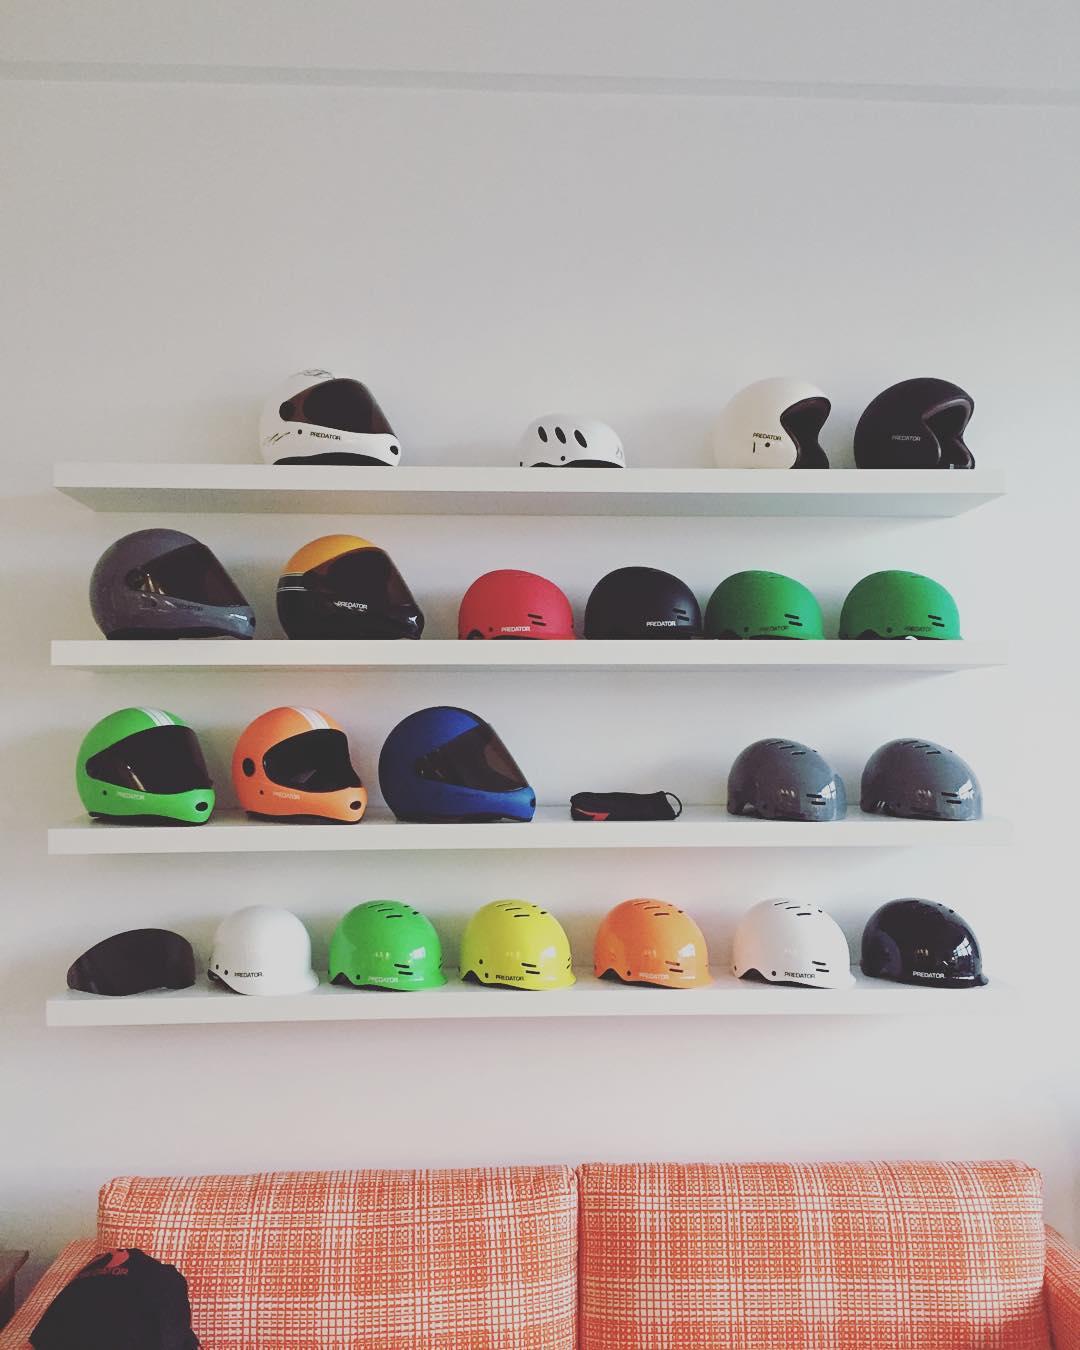 #predator #skateboard and #watersports helmets. #originalpredatordesign